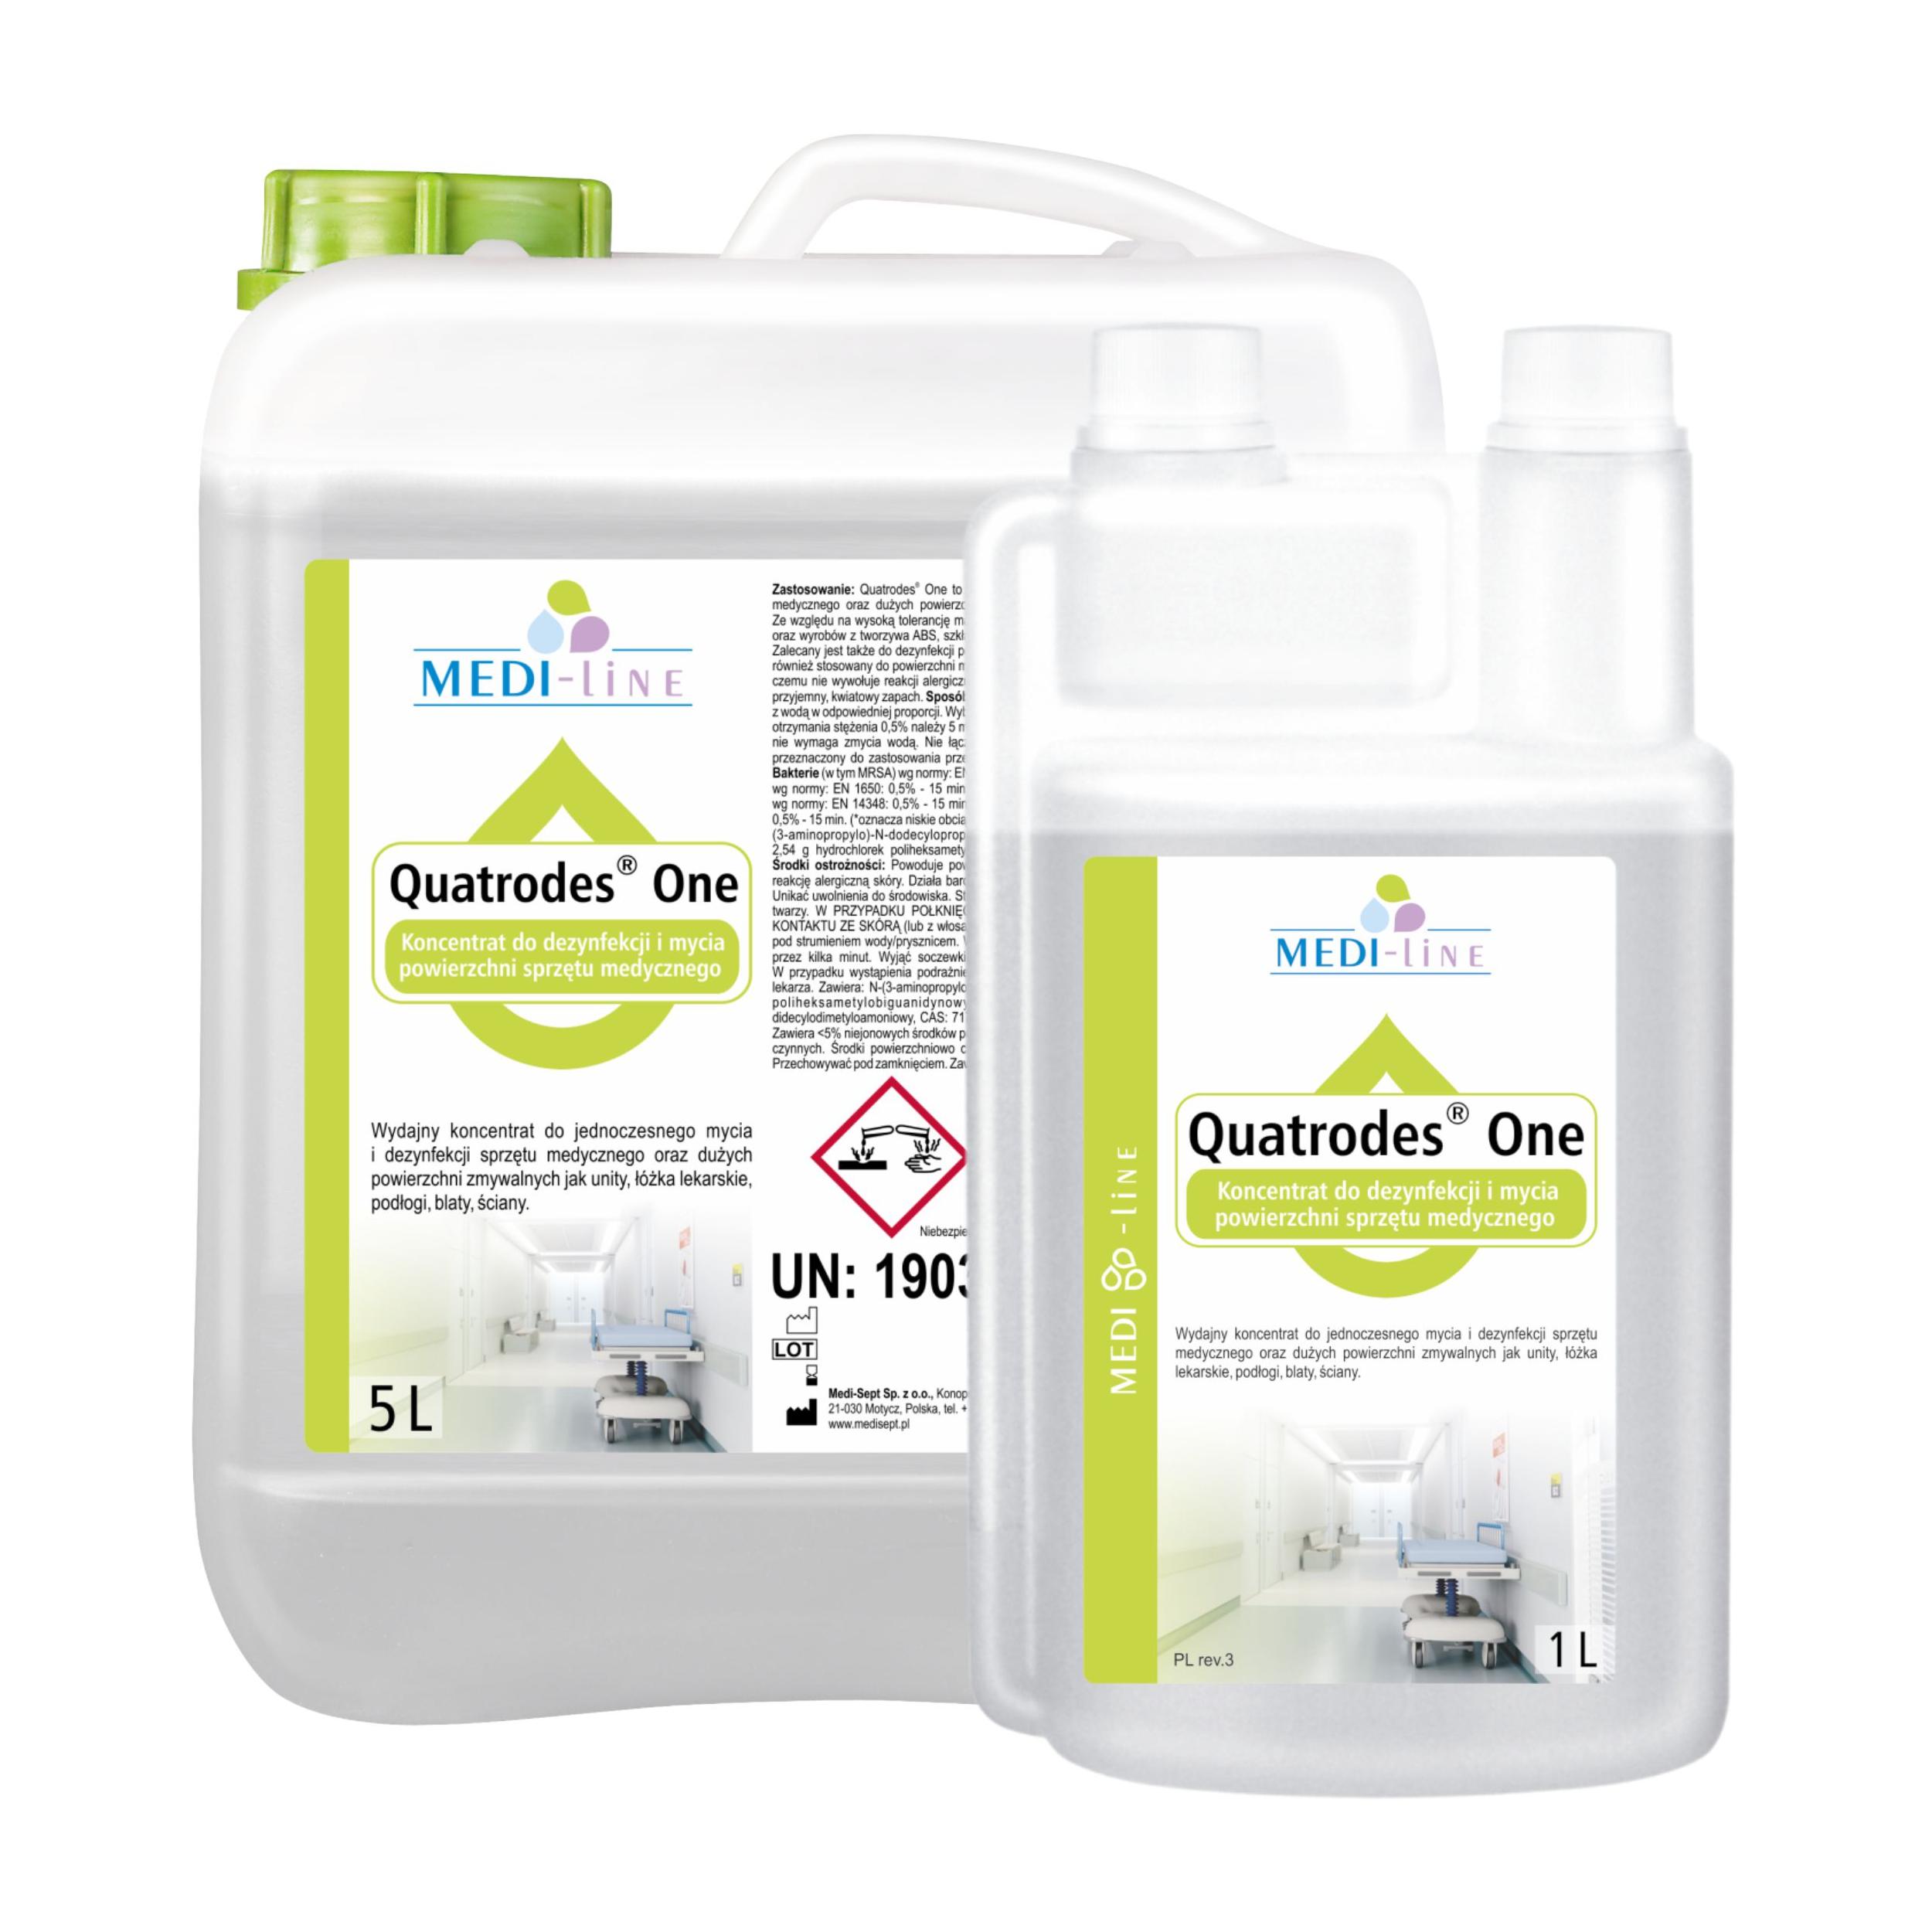 Quatrodes One